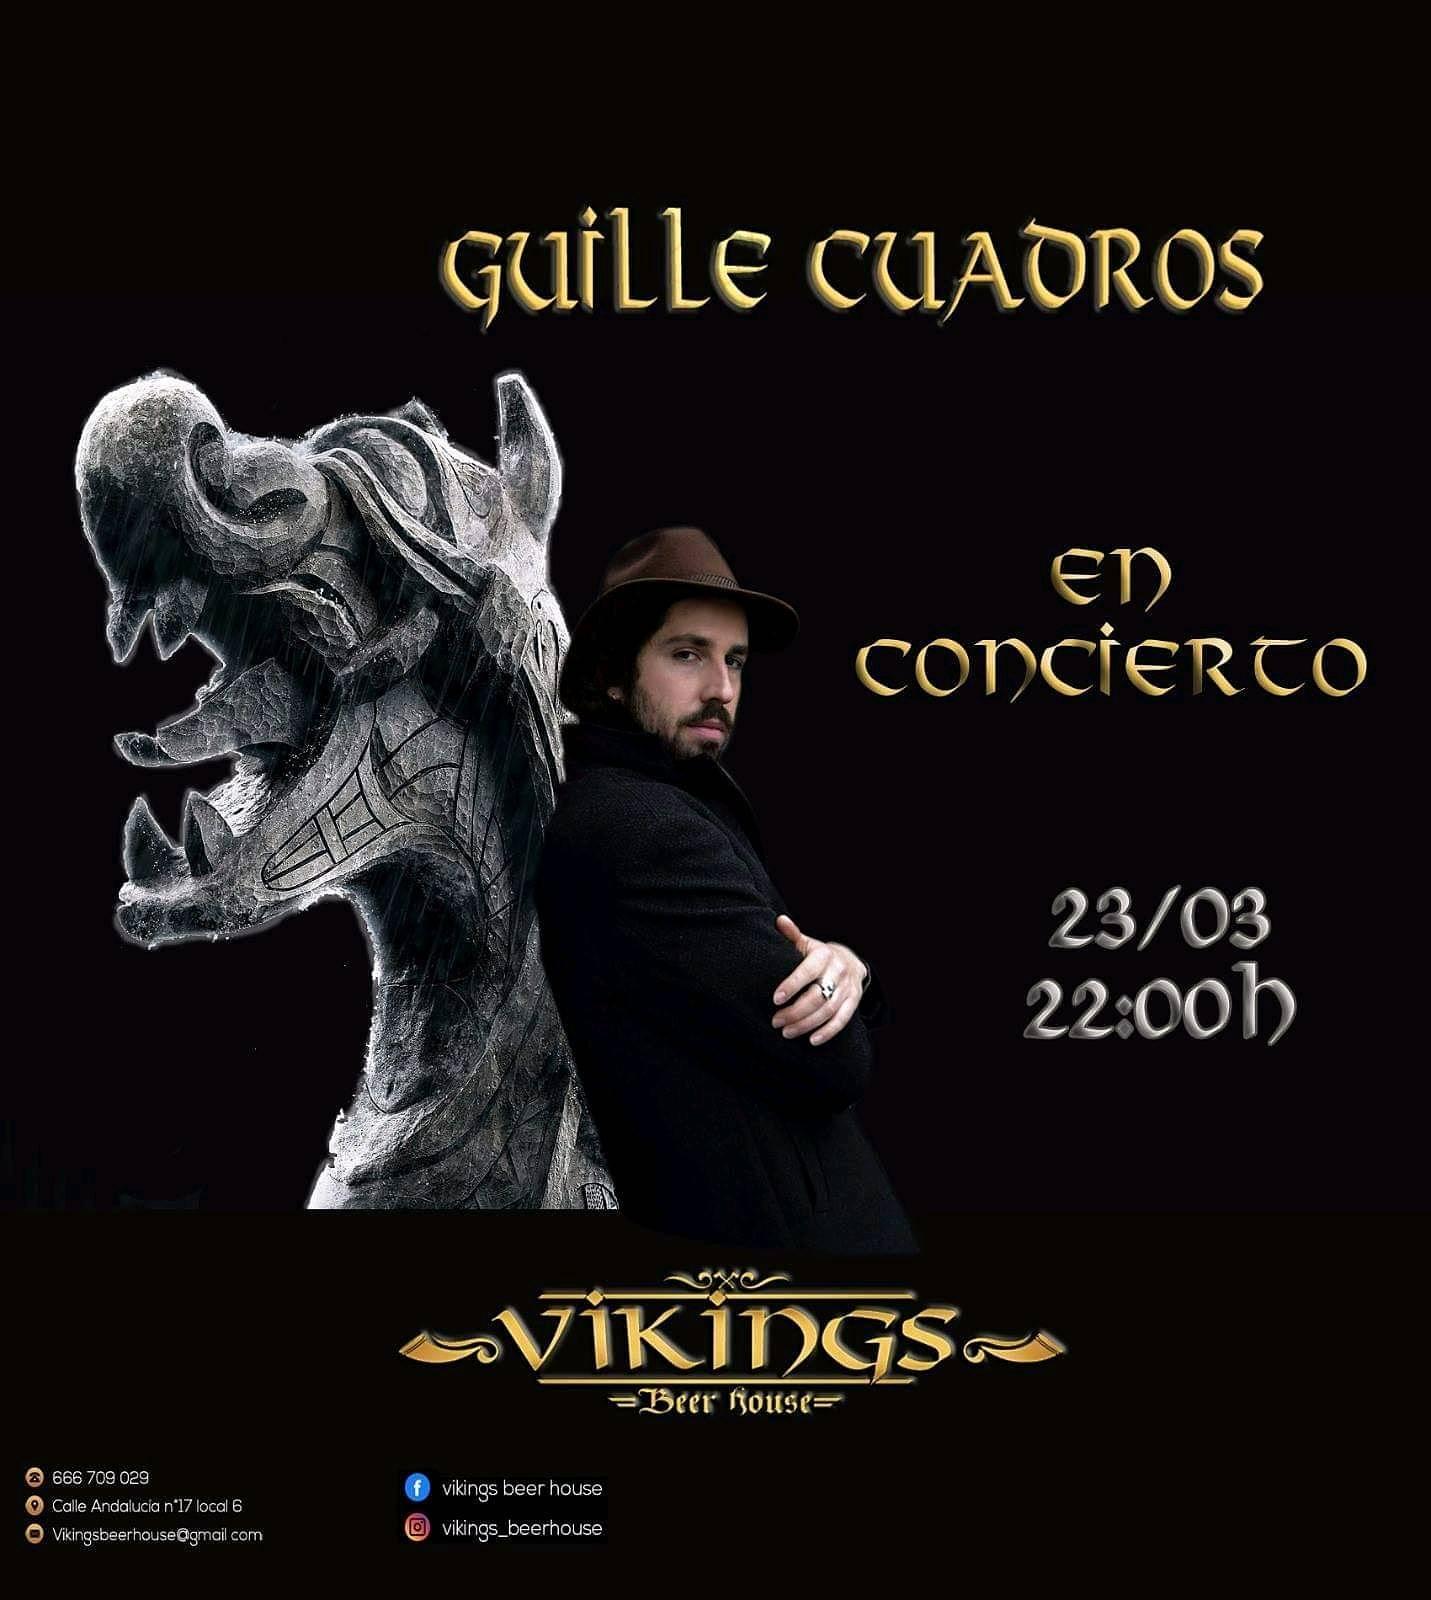 GUILLE CUADROS estará actuando este sábado 23 de marzo en Vikings Beer House (San Pedro De Alcántara)